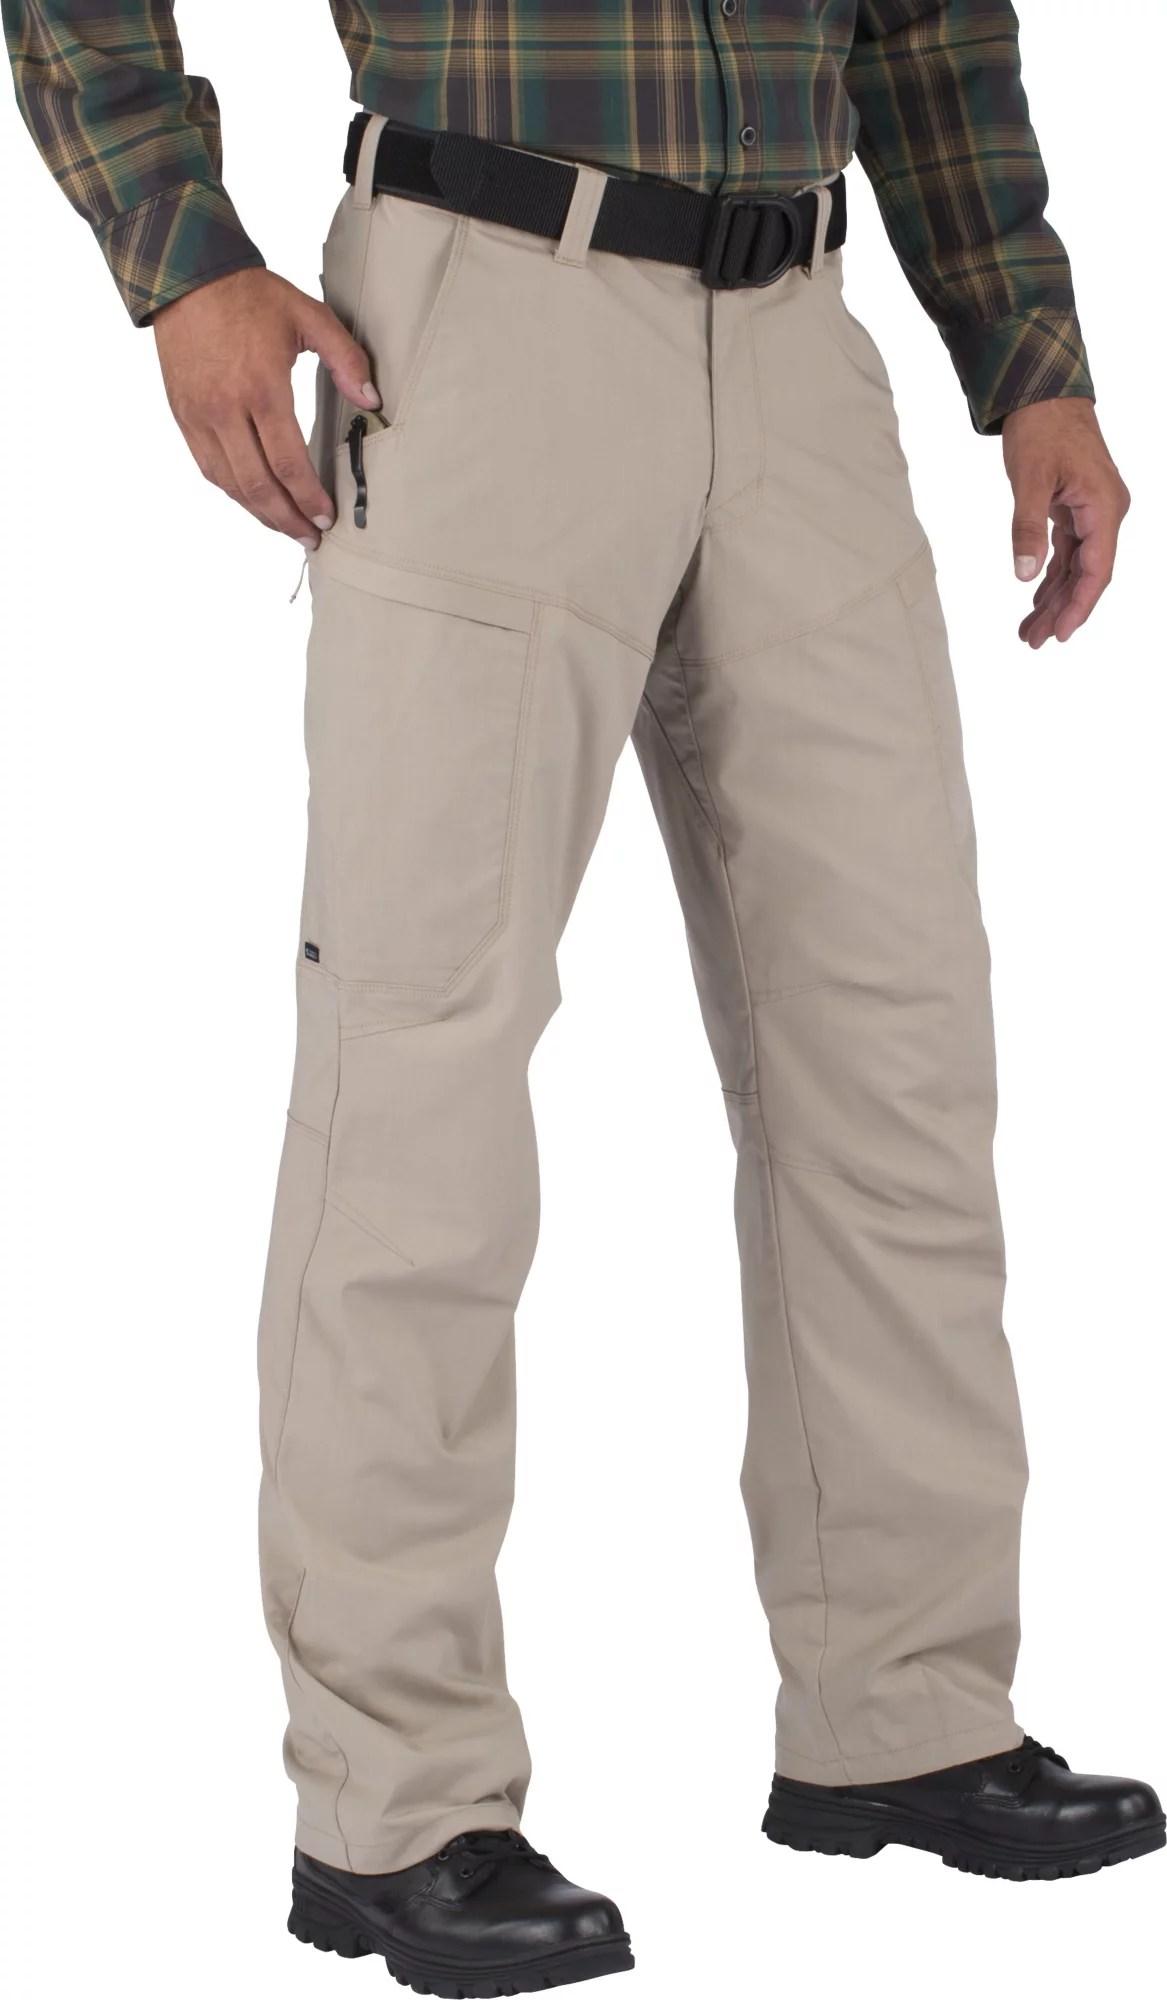 medium resolution of 5 11 tactical men s apex pants noimagefound 1